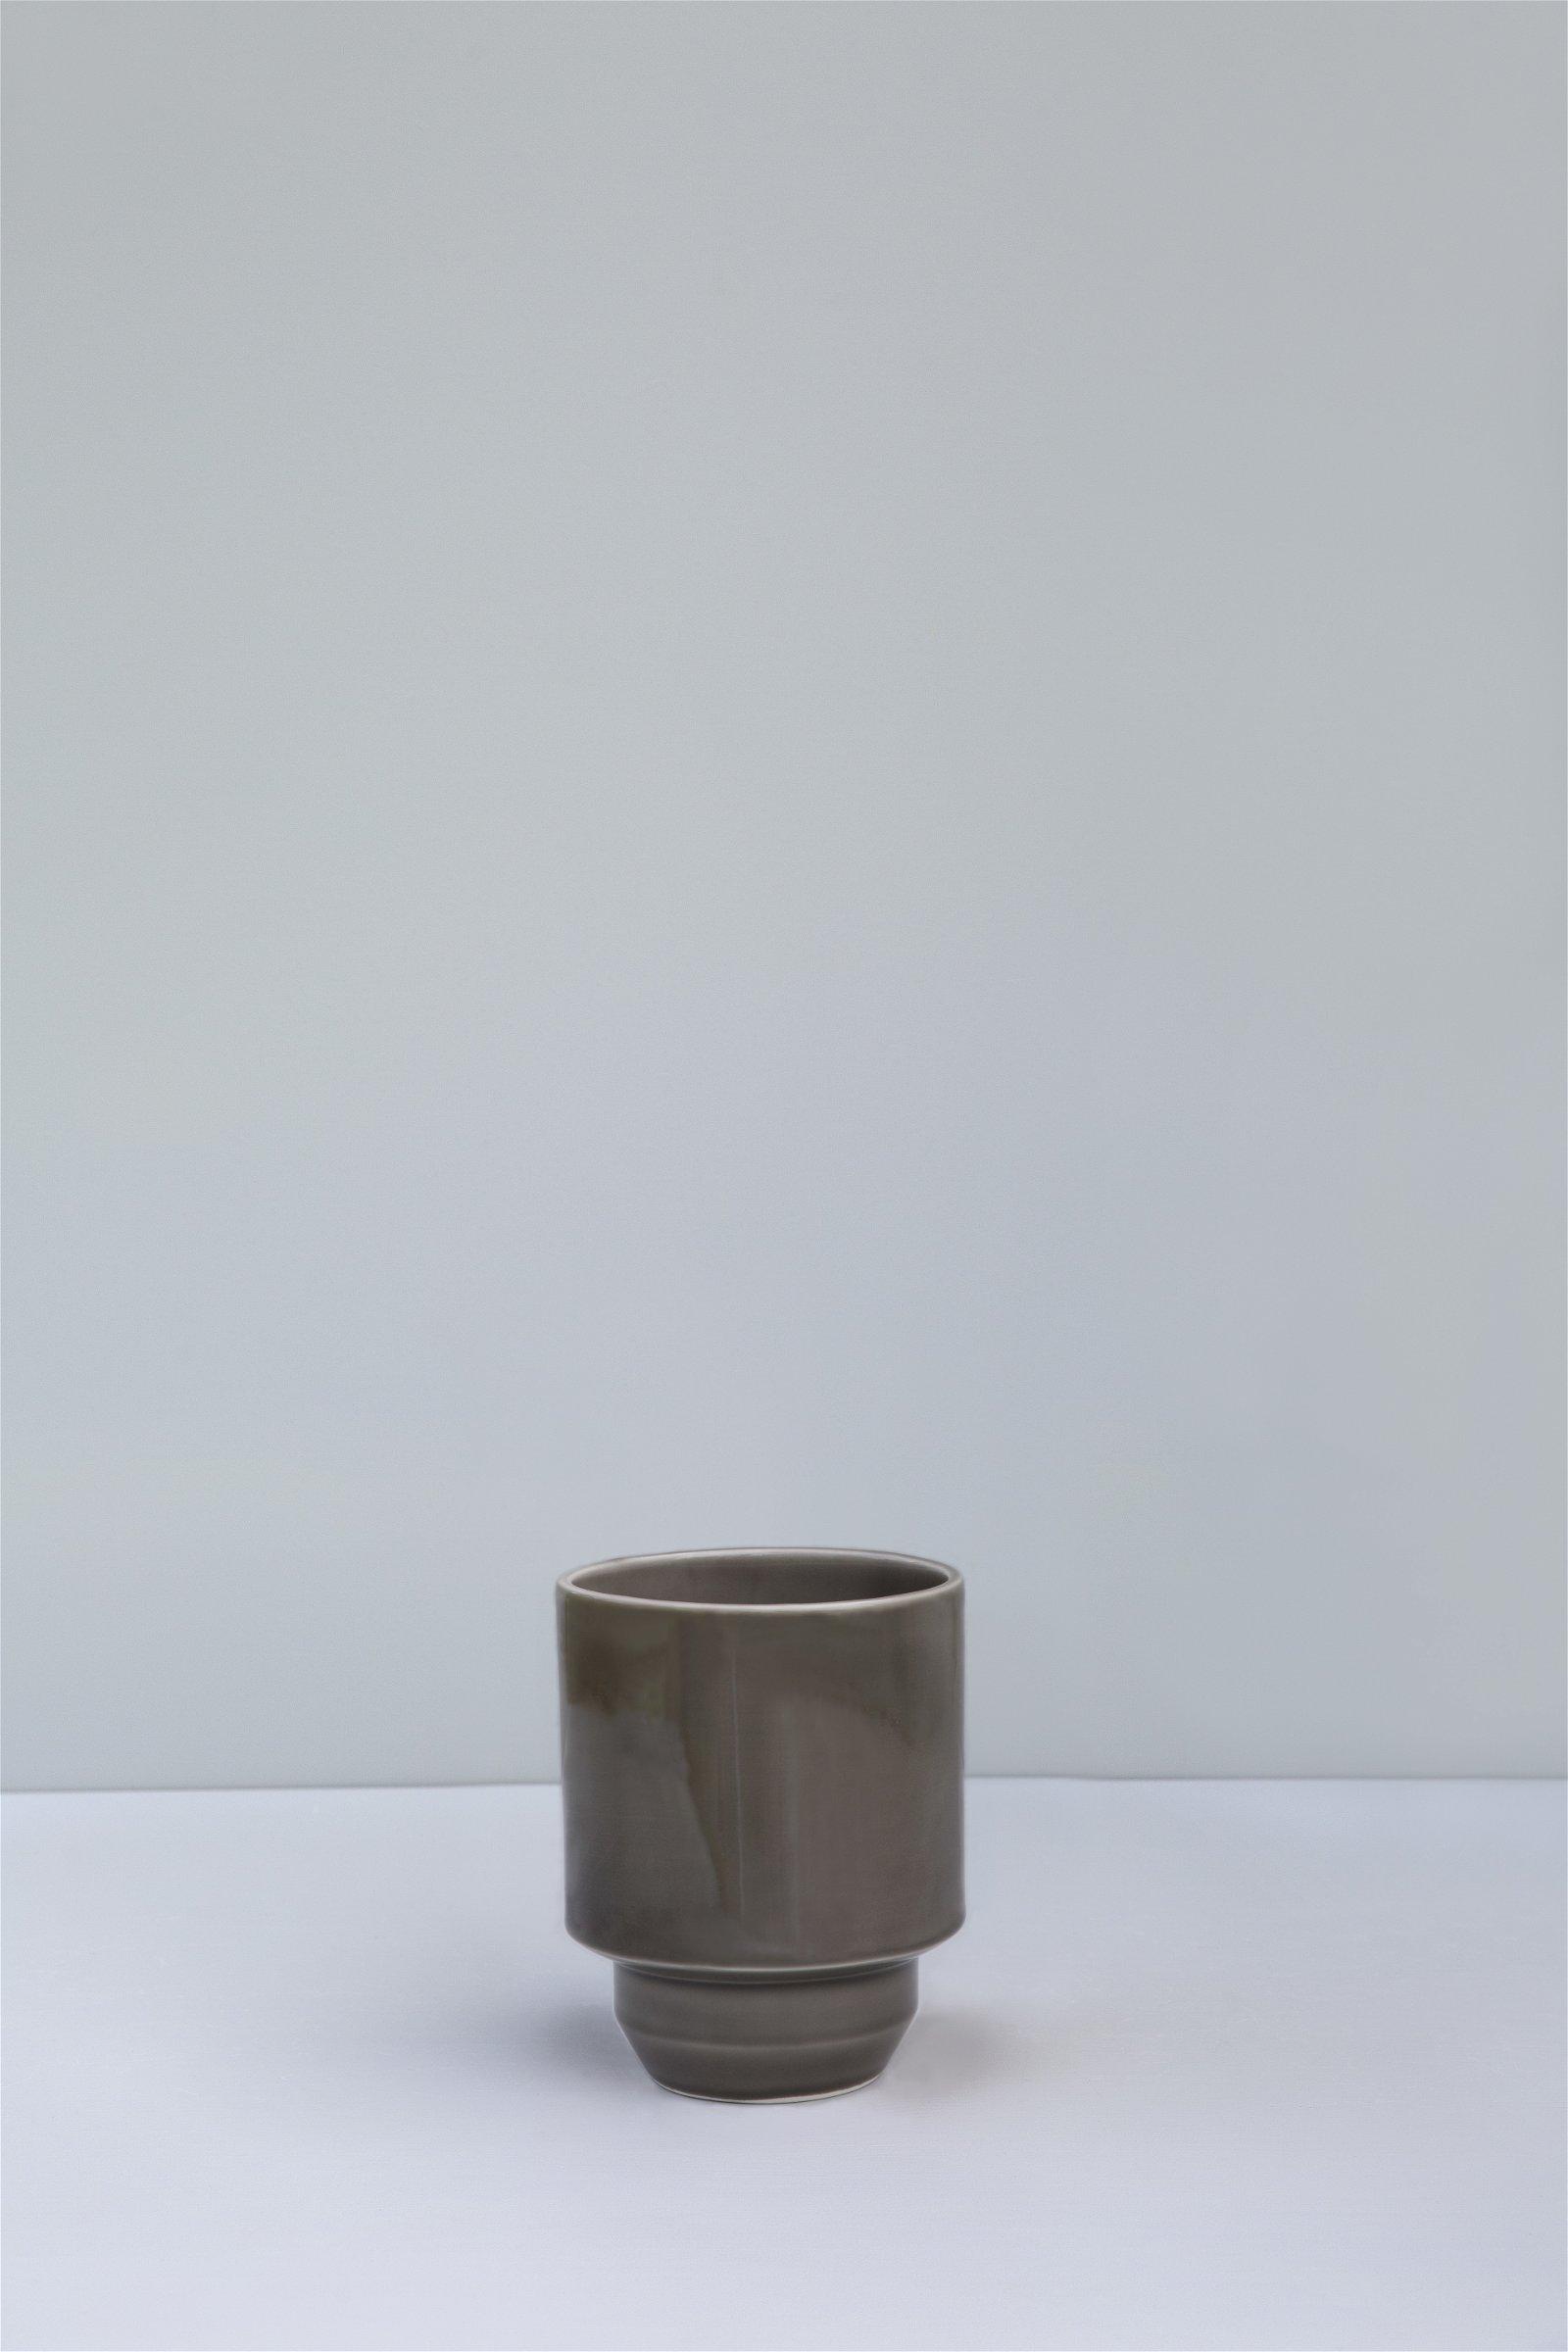 Bergs Potter, The Hoff Pot GLAZED: Pearl Grey, 18 cm, Potte